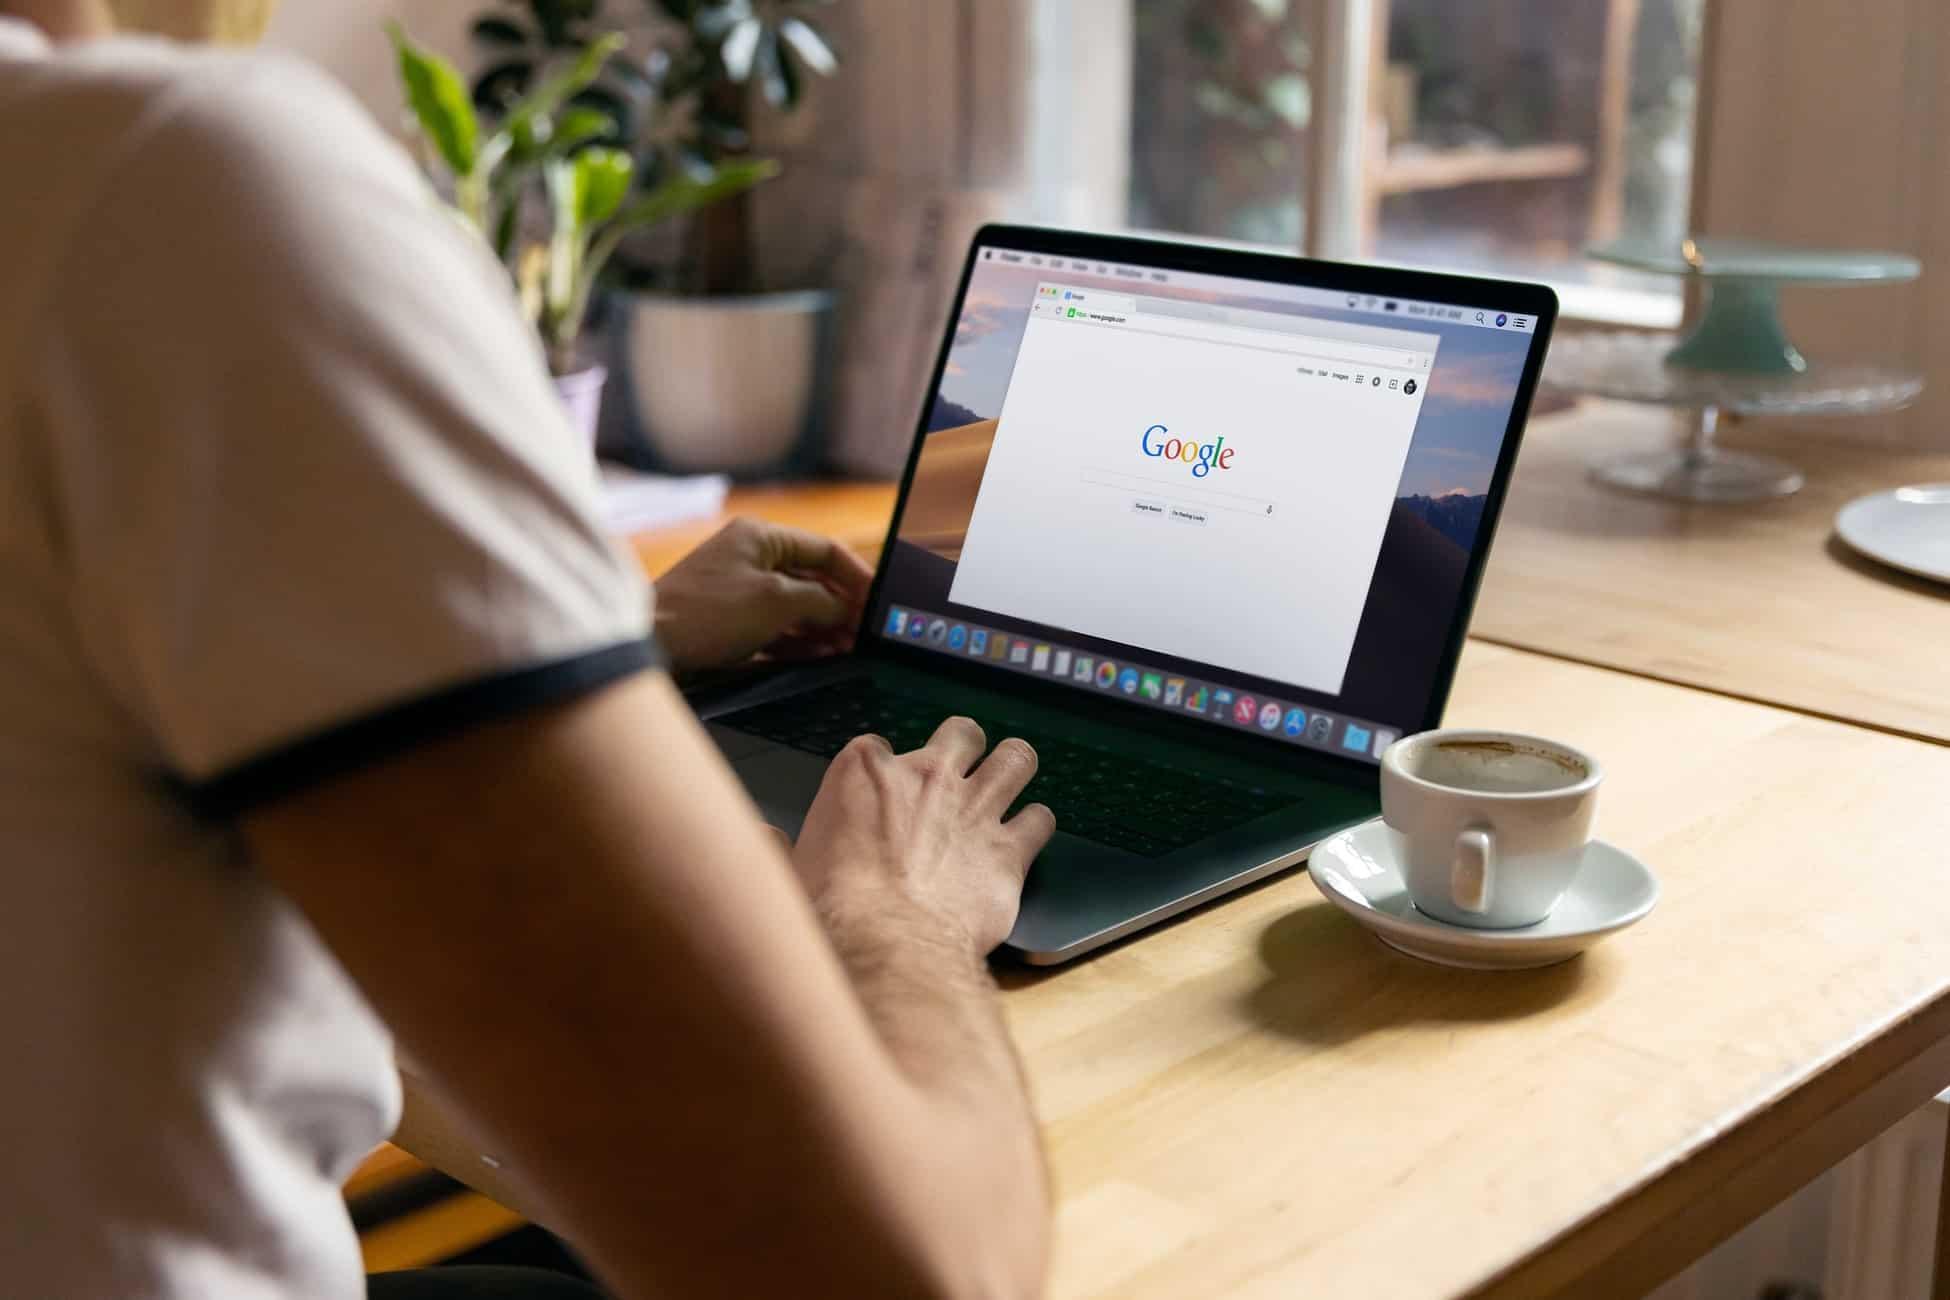 Person using Google search.